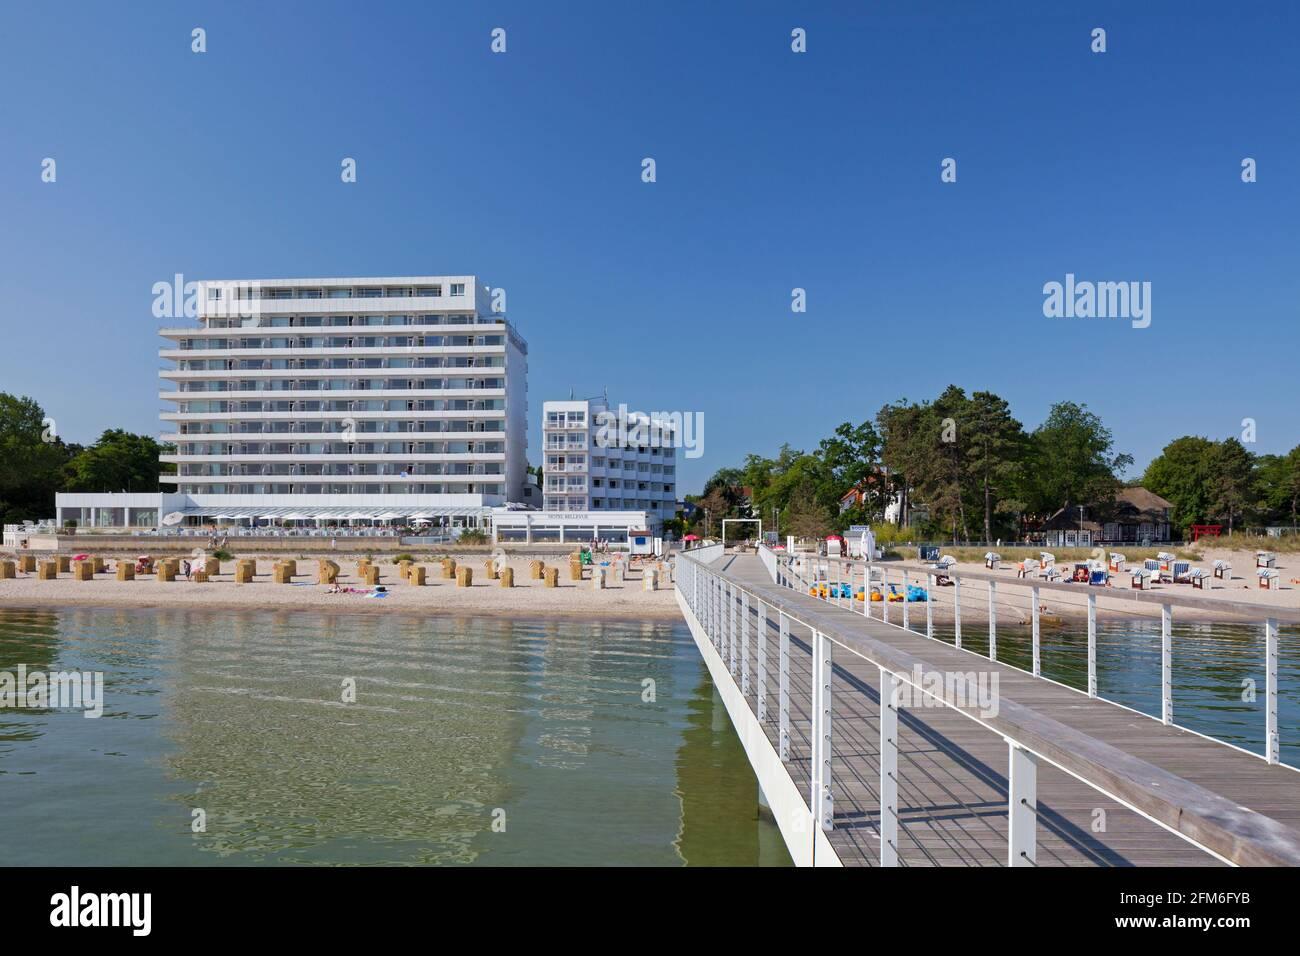 Pier et Hotel Bellevue à Timmendorfer Strand / Plage Timmendorf, station balnéaire le long de la mer Baltique, Ostholstein, Schleswig-Holstein, Allemagne Banque D'Images